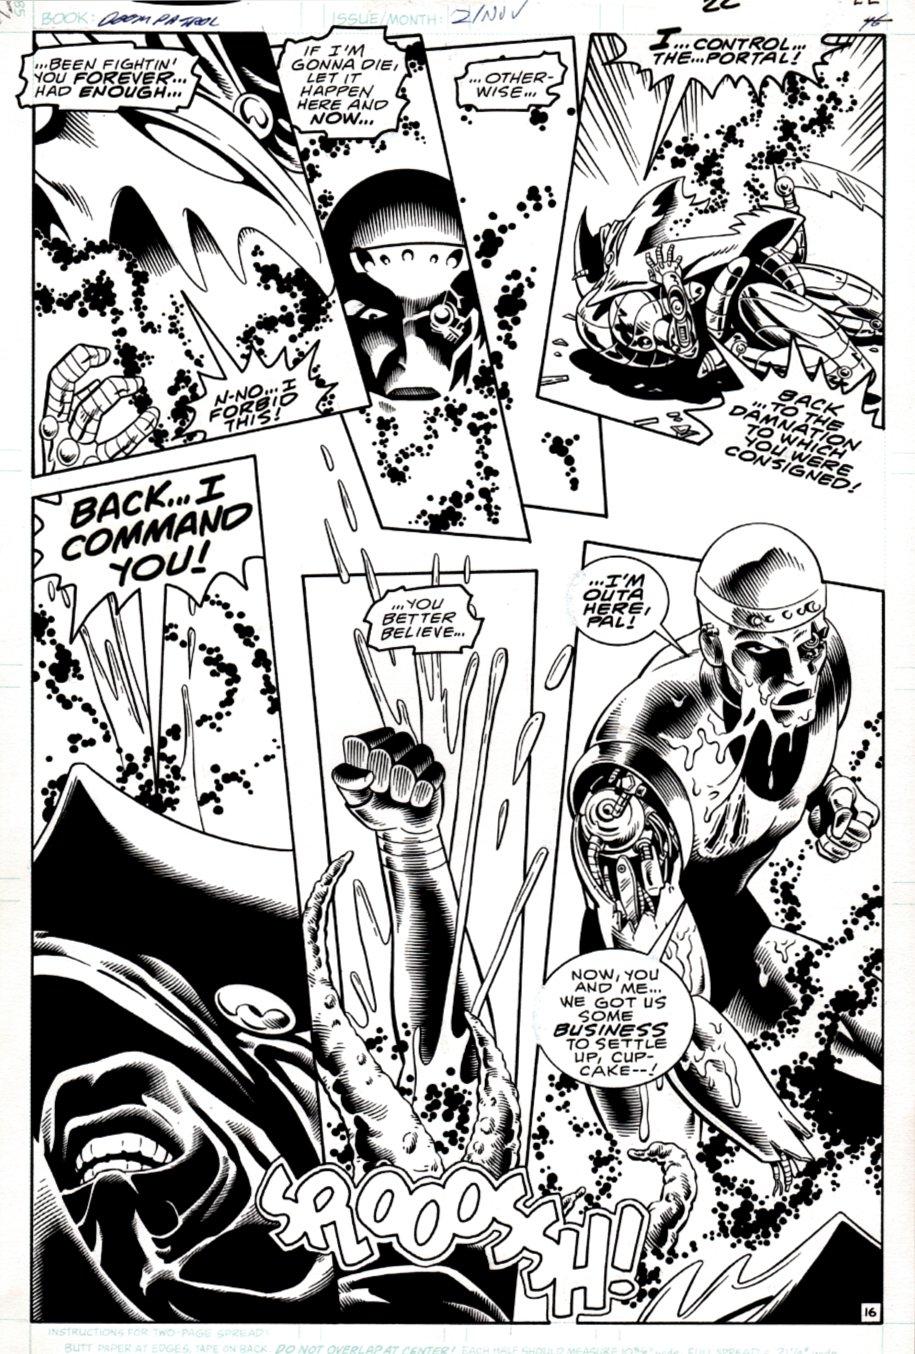 Doom Patrol #2 p 16 (AWESOME ROBOTMAN BATTLE PAGE!) 1987